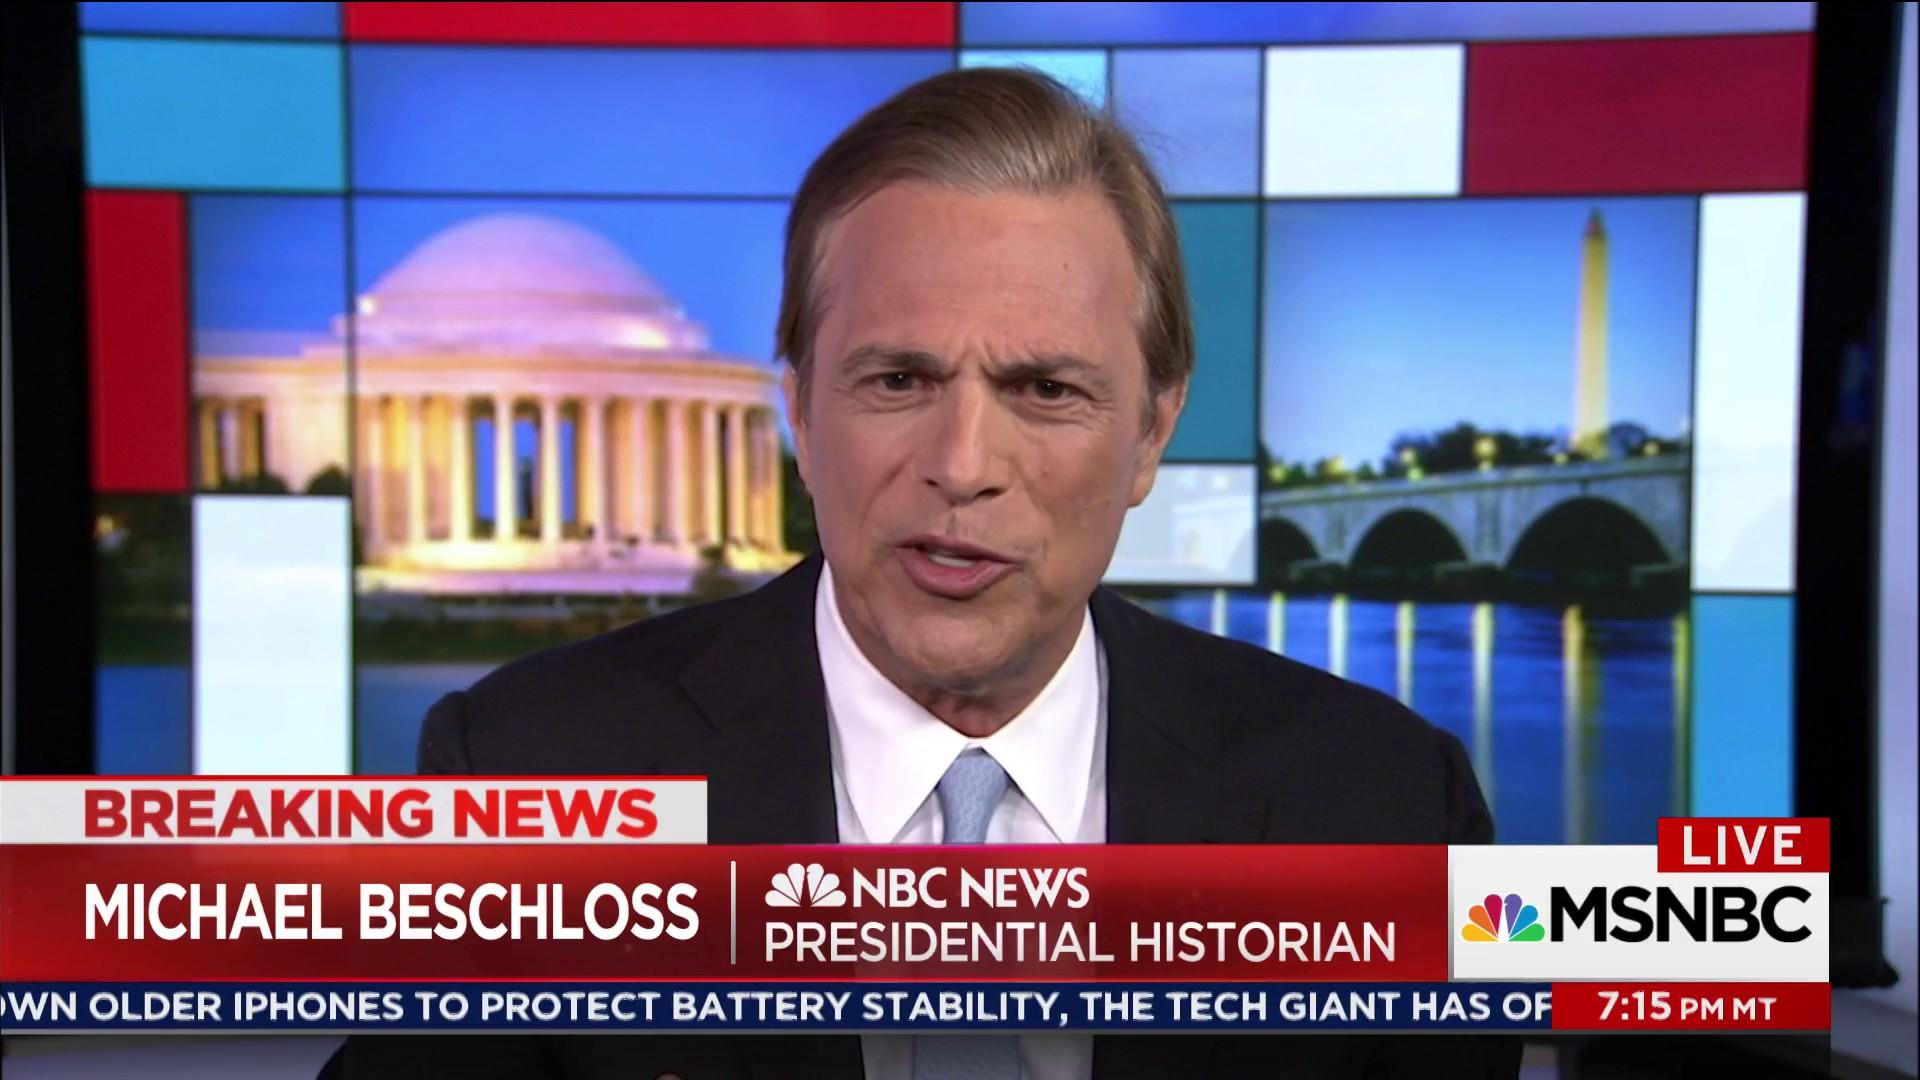 Trump assertions on DoJ farther than Nixon